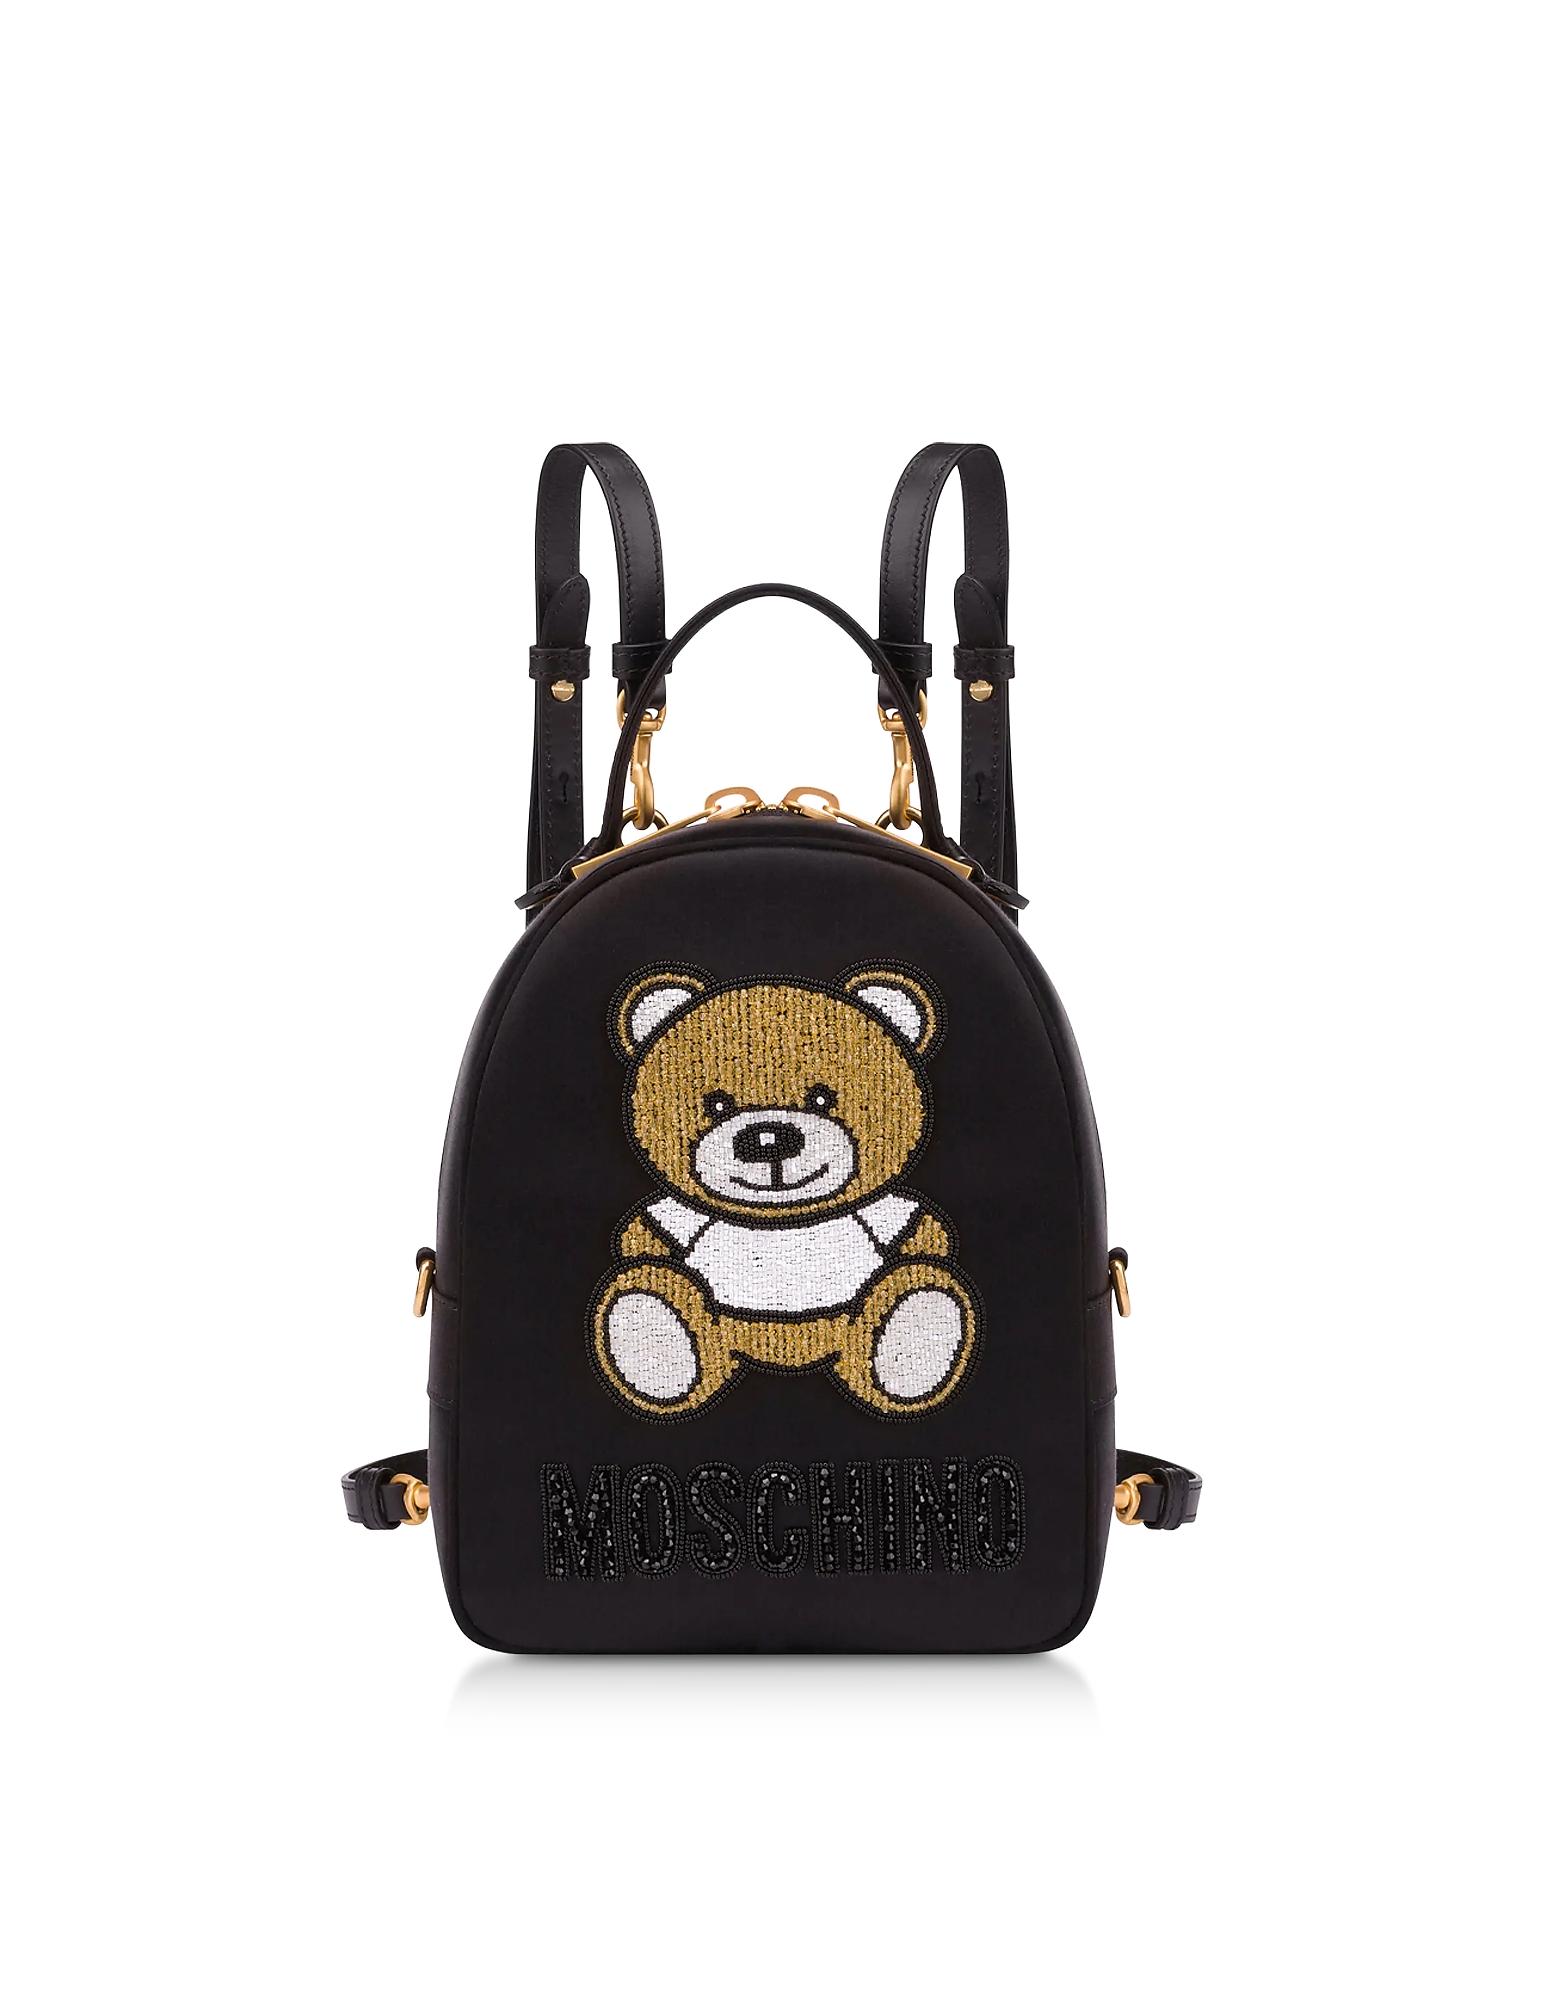 UPC 820771817306 product image for Moschino Designer Handbags, Black Teddy Bear Chain Backpack   upcitemdb.com